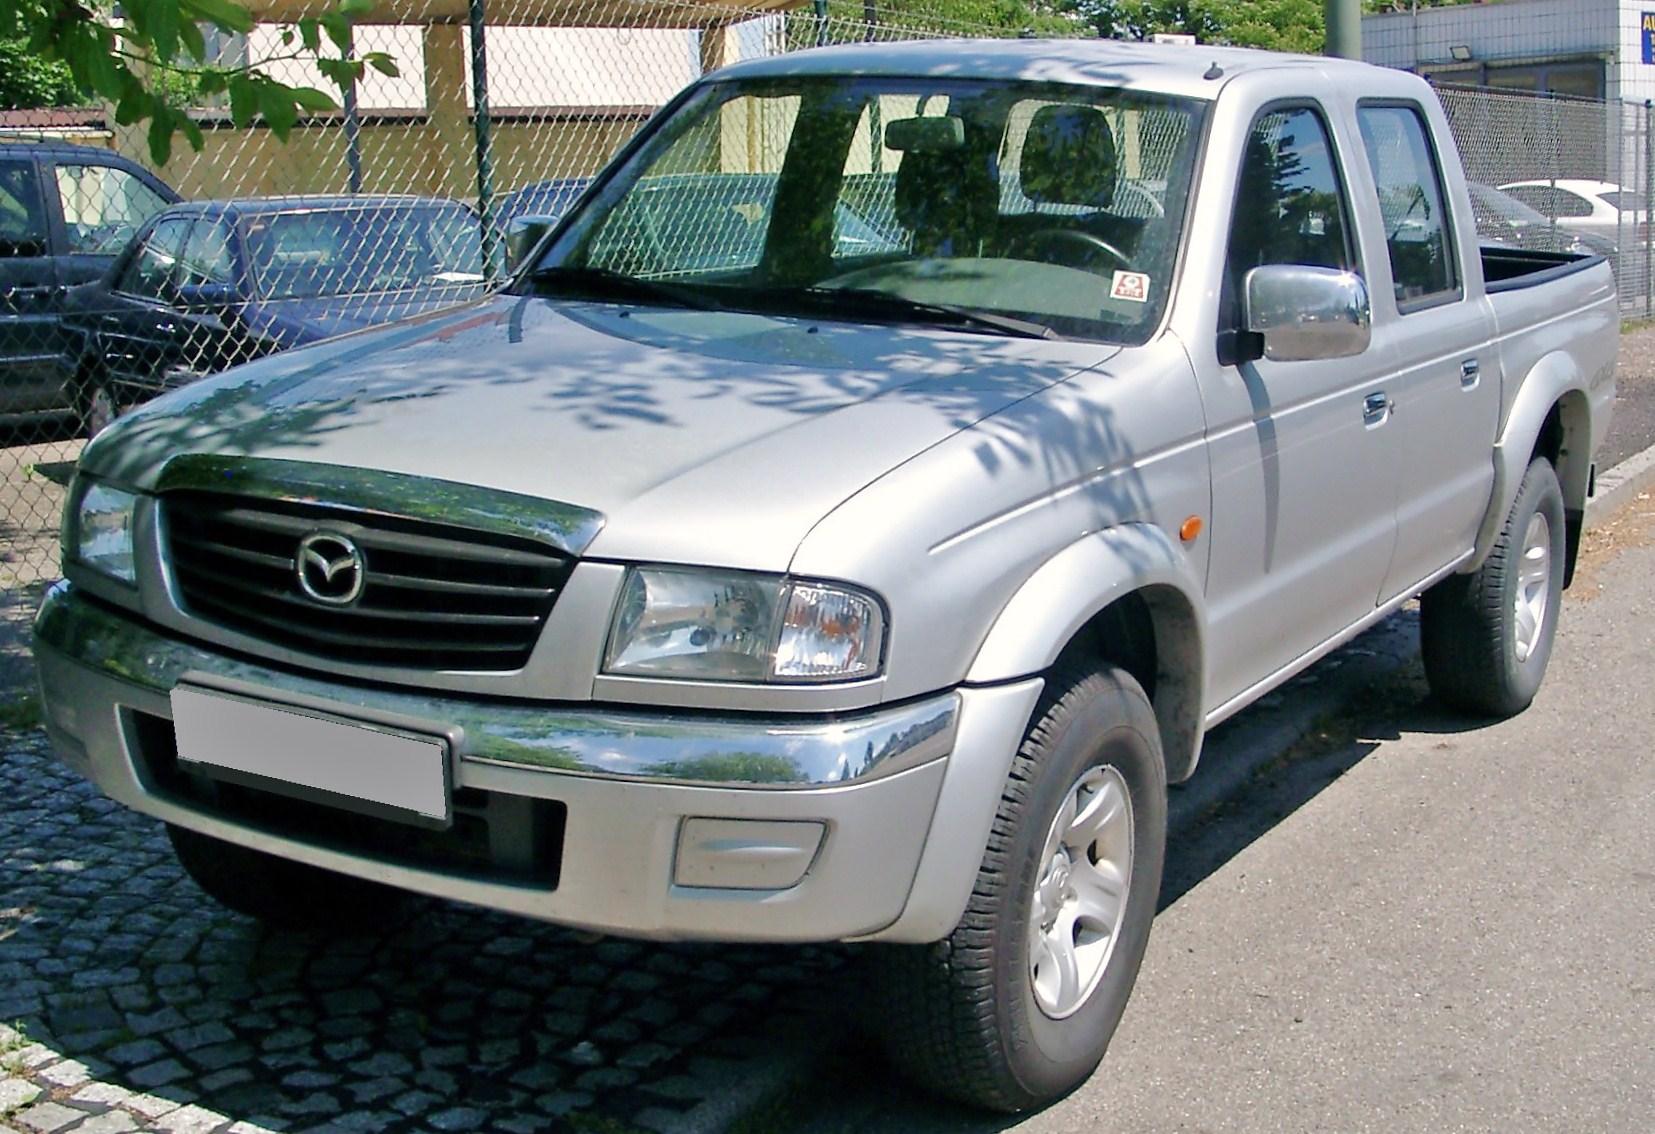 https://upload.wikimedia.org/wikipedia/commons/7/7c/Mazda_B2500_front_20080612.jpg